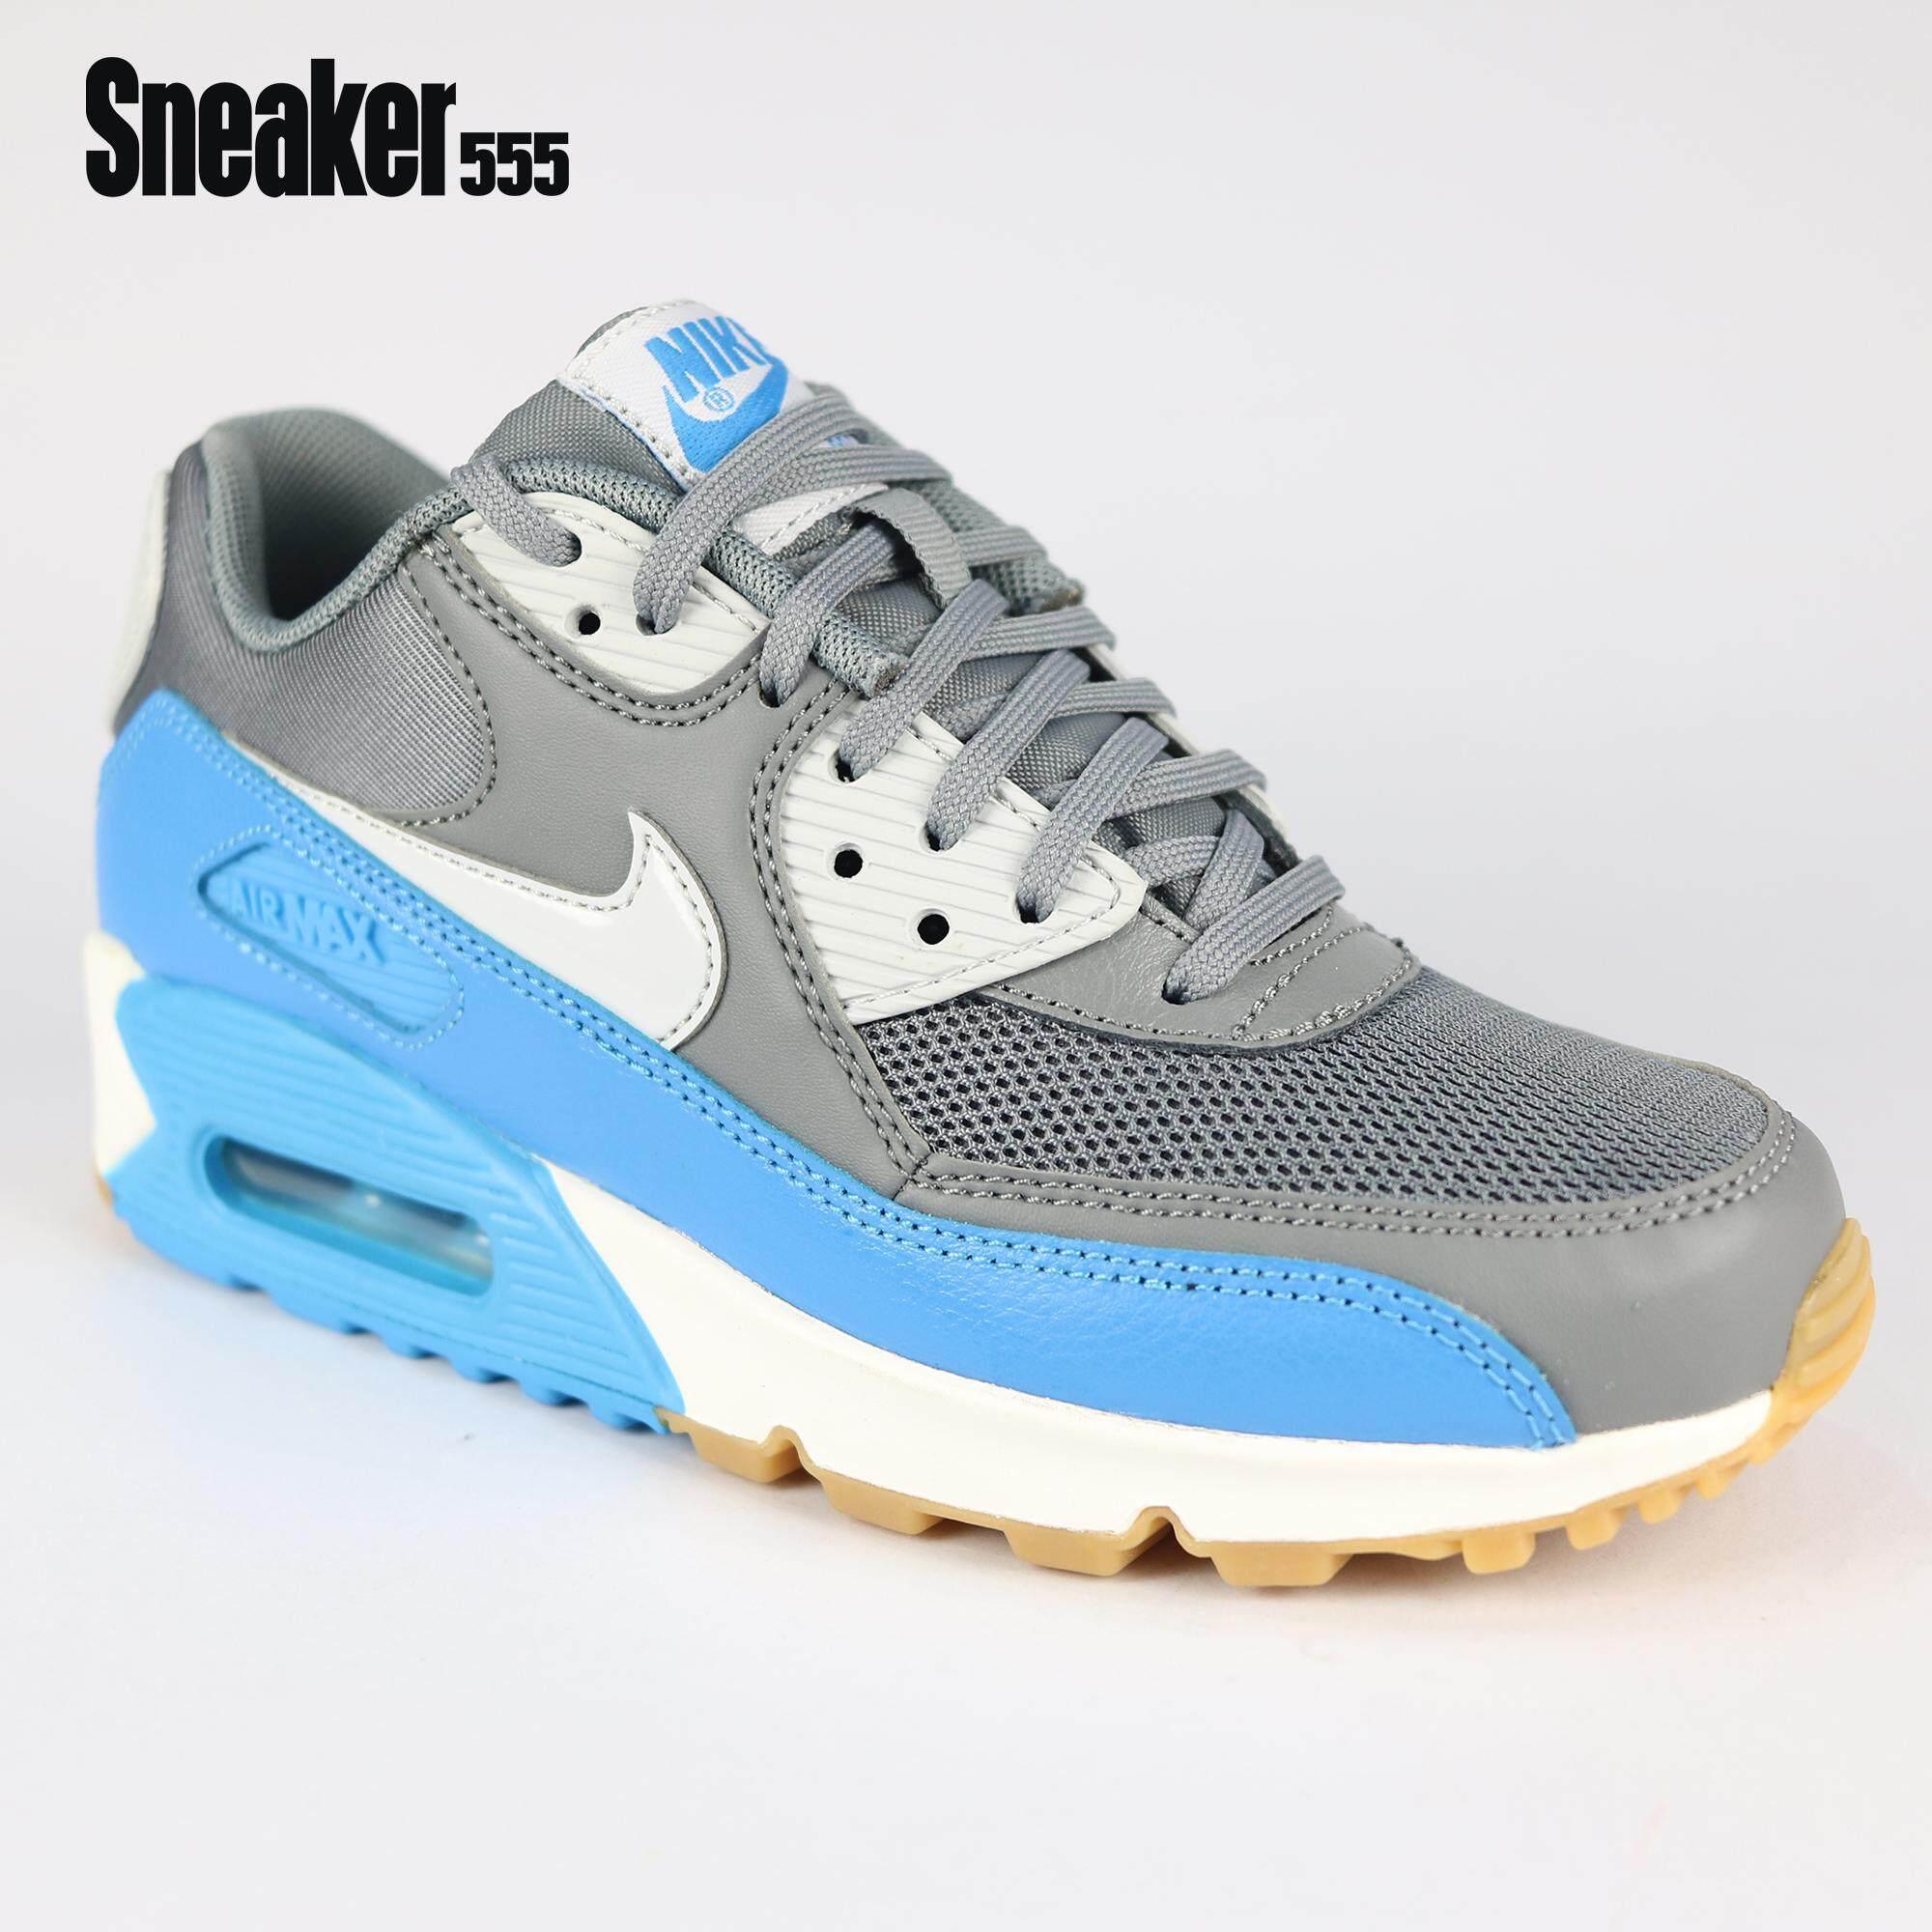 hot sale online 634e5 0b702 รองเท้าผ้าใบ ไนกี้ รุ่น WMIS AIR MAX 90 ESSENTIAL สำหรับผู้ชาย  สีเทา-ฟ้า-ขาว - NIKE WMIS AIR MAX 90 ESSENTIAL SHOE CL GRY PR PLTNM-BL  GLW-SMMT WH